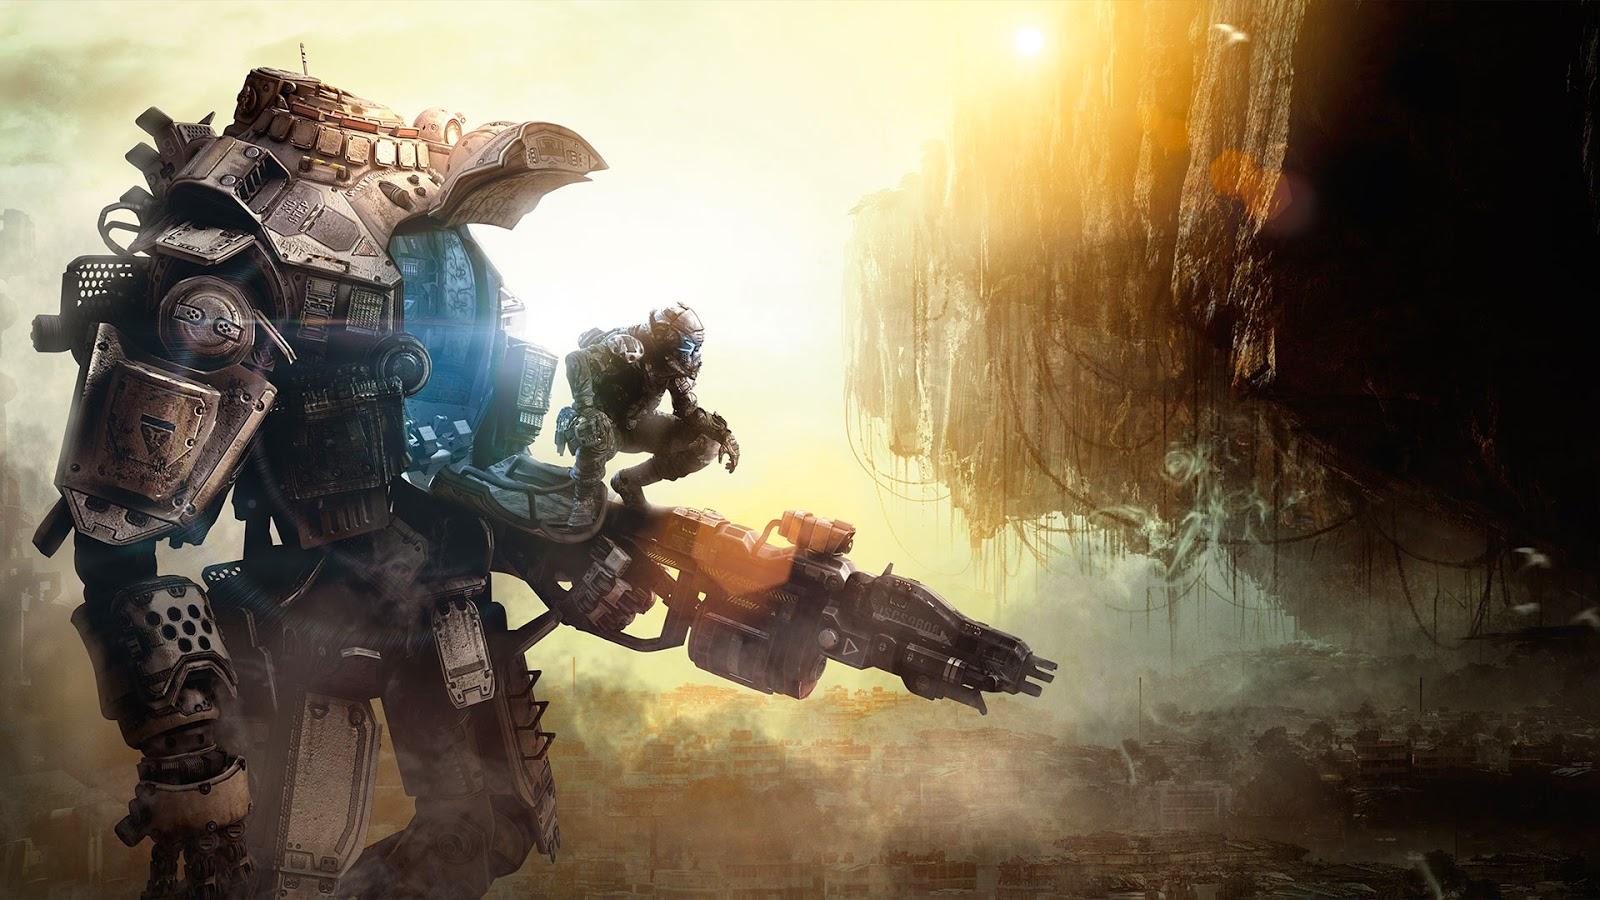 Titanfall-Pc-Games-Wallpaper-2014